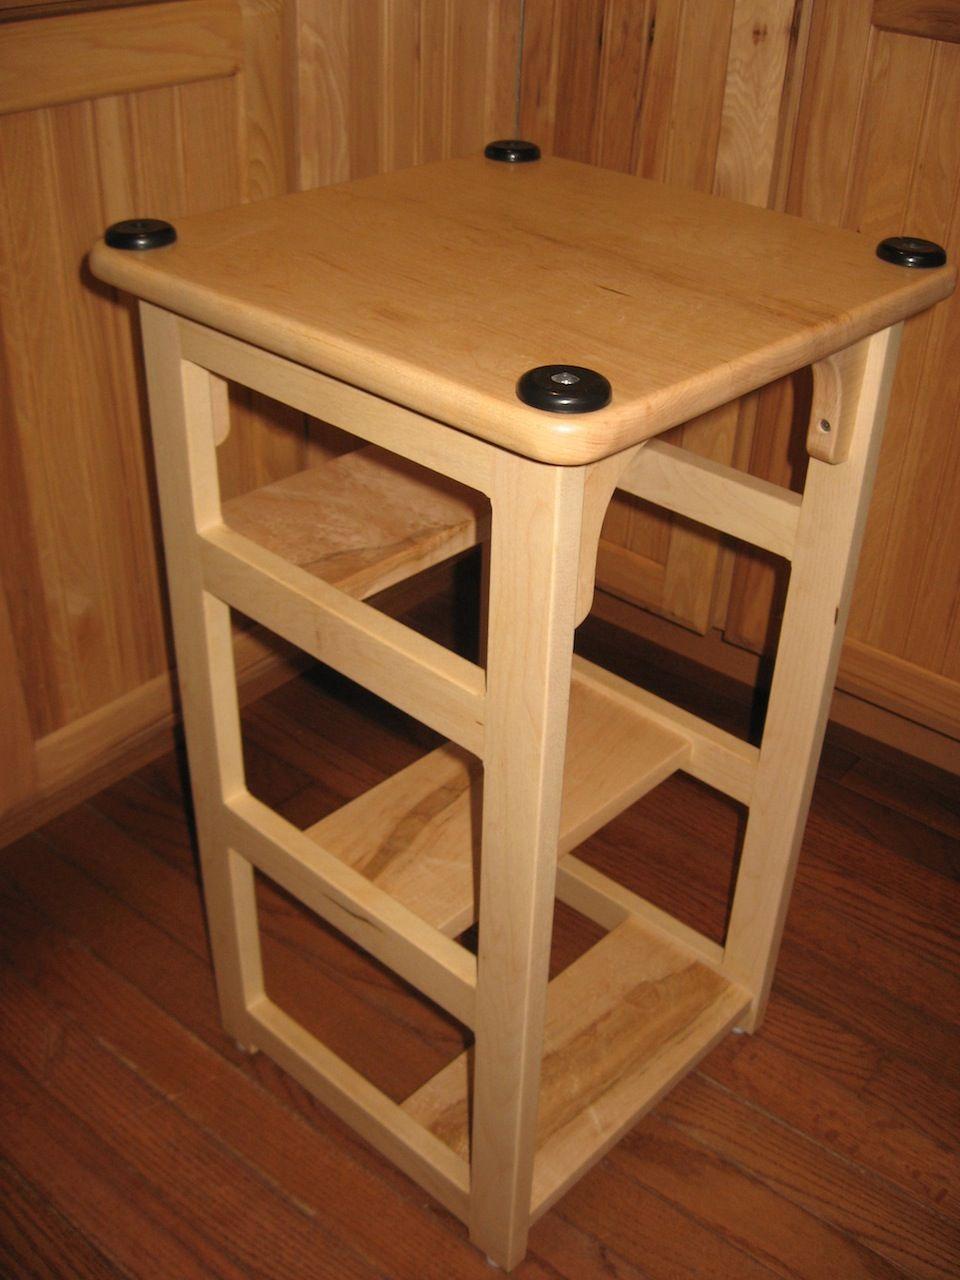 Cool Stans Hoosier Step Stool 3 Idea Love Love Diy Alphanode Cool Chair Designs And Ideas Alphanodeonline